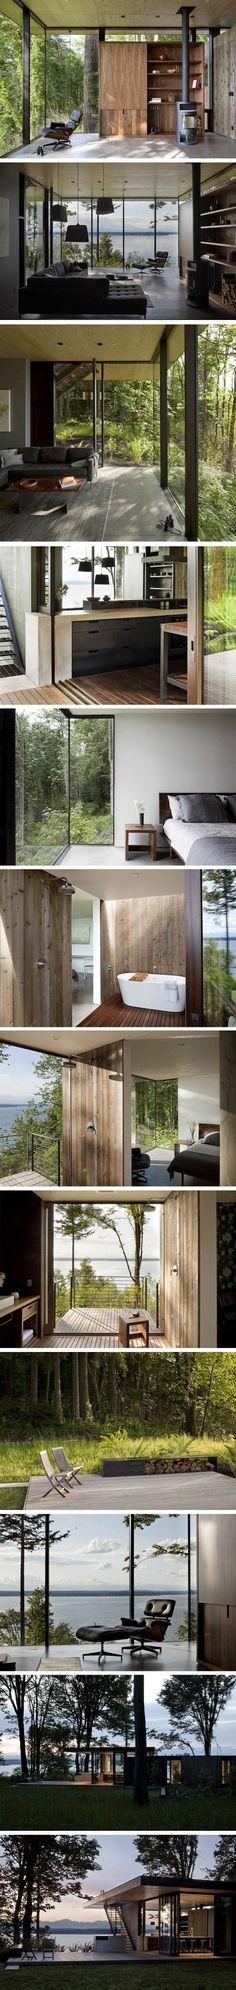 Case Inlet Retreat par MW/Works Architecture+Design - Journal du Design